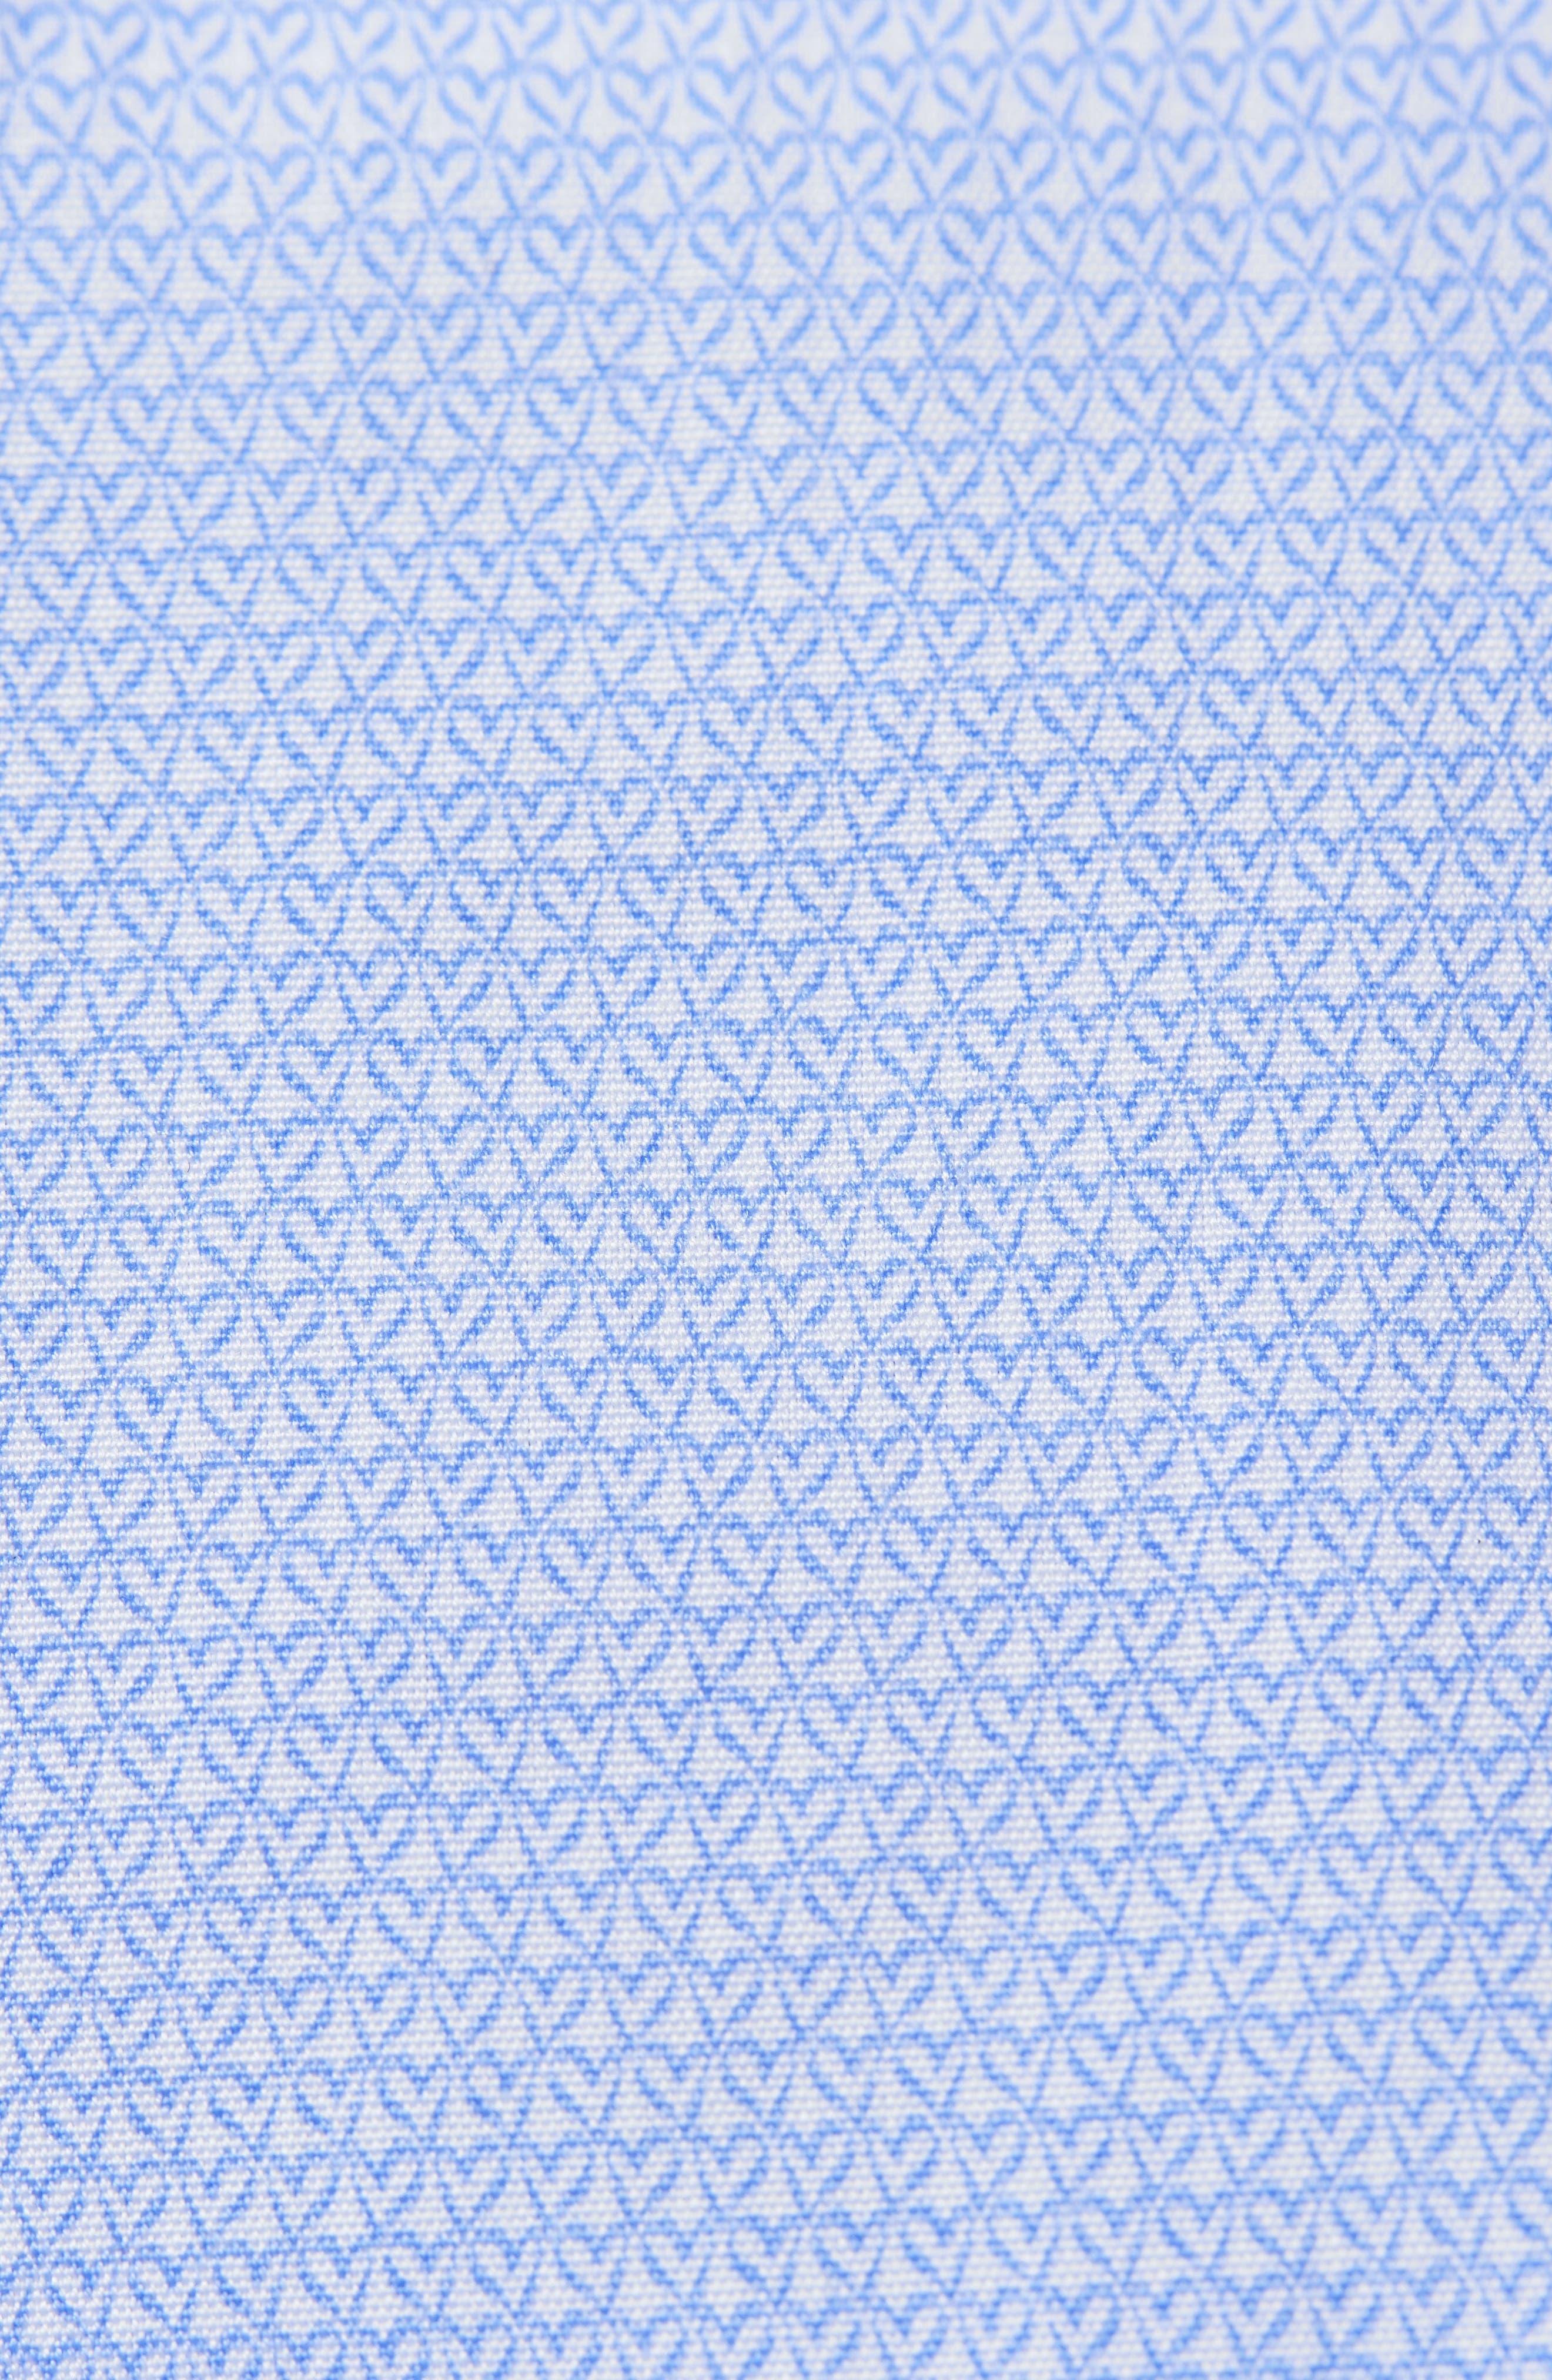 Slim Fit Print Dress Shirt,                             Alternate thumbnail 3, color,                             Blue